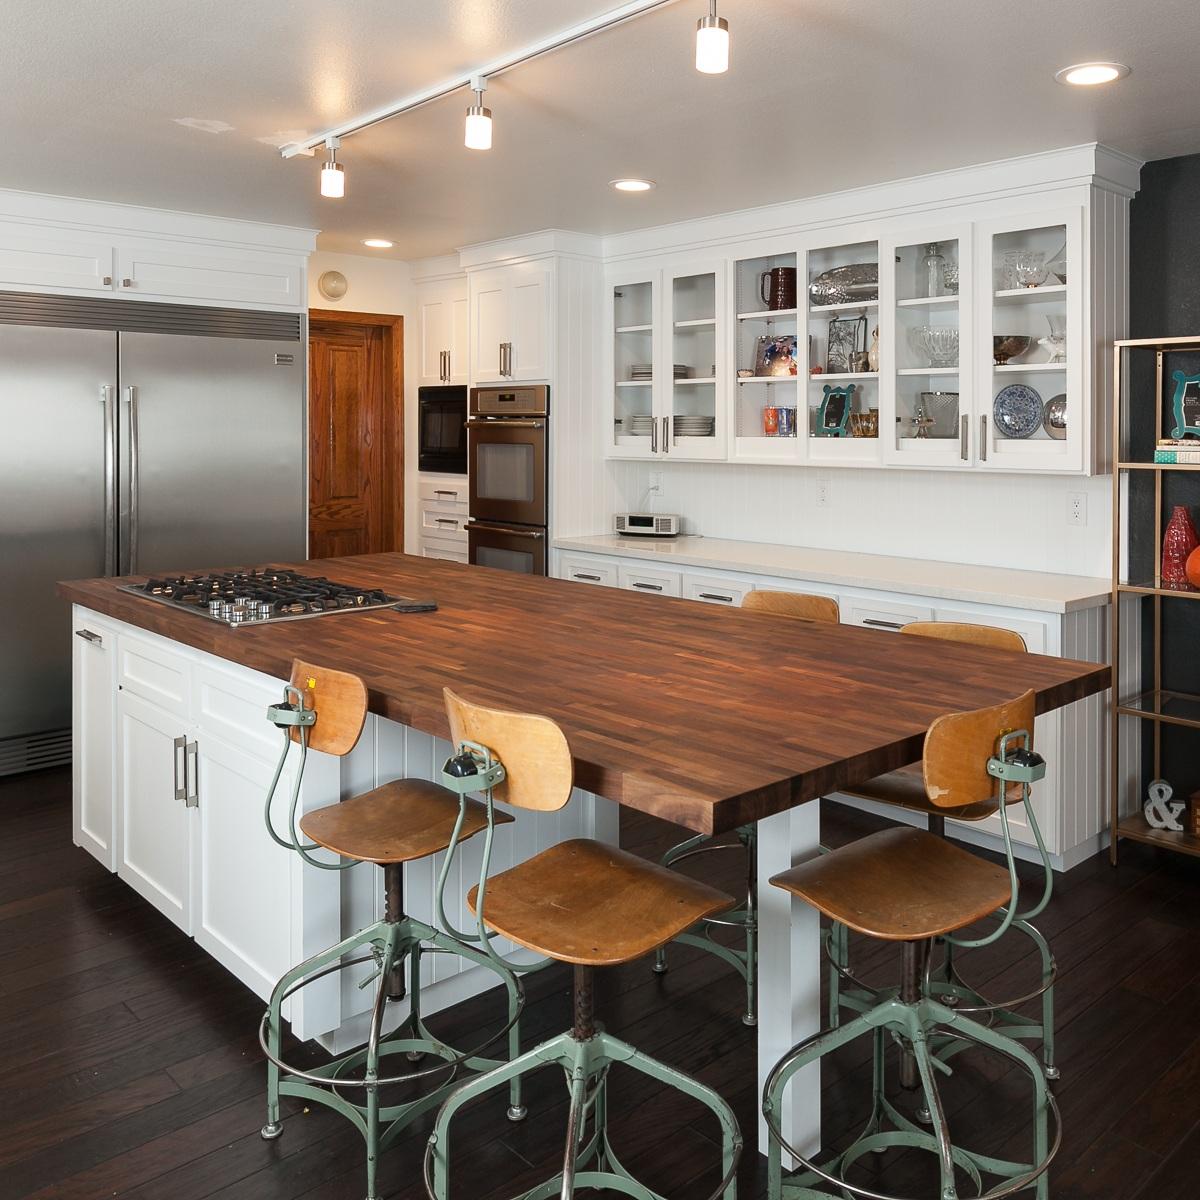 Songbird Residence - MID CENTURY MODERN KITCHEN, DINING ROOM, & LIVING ROOM Remodel